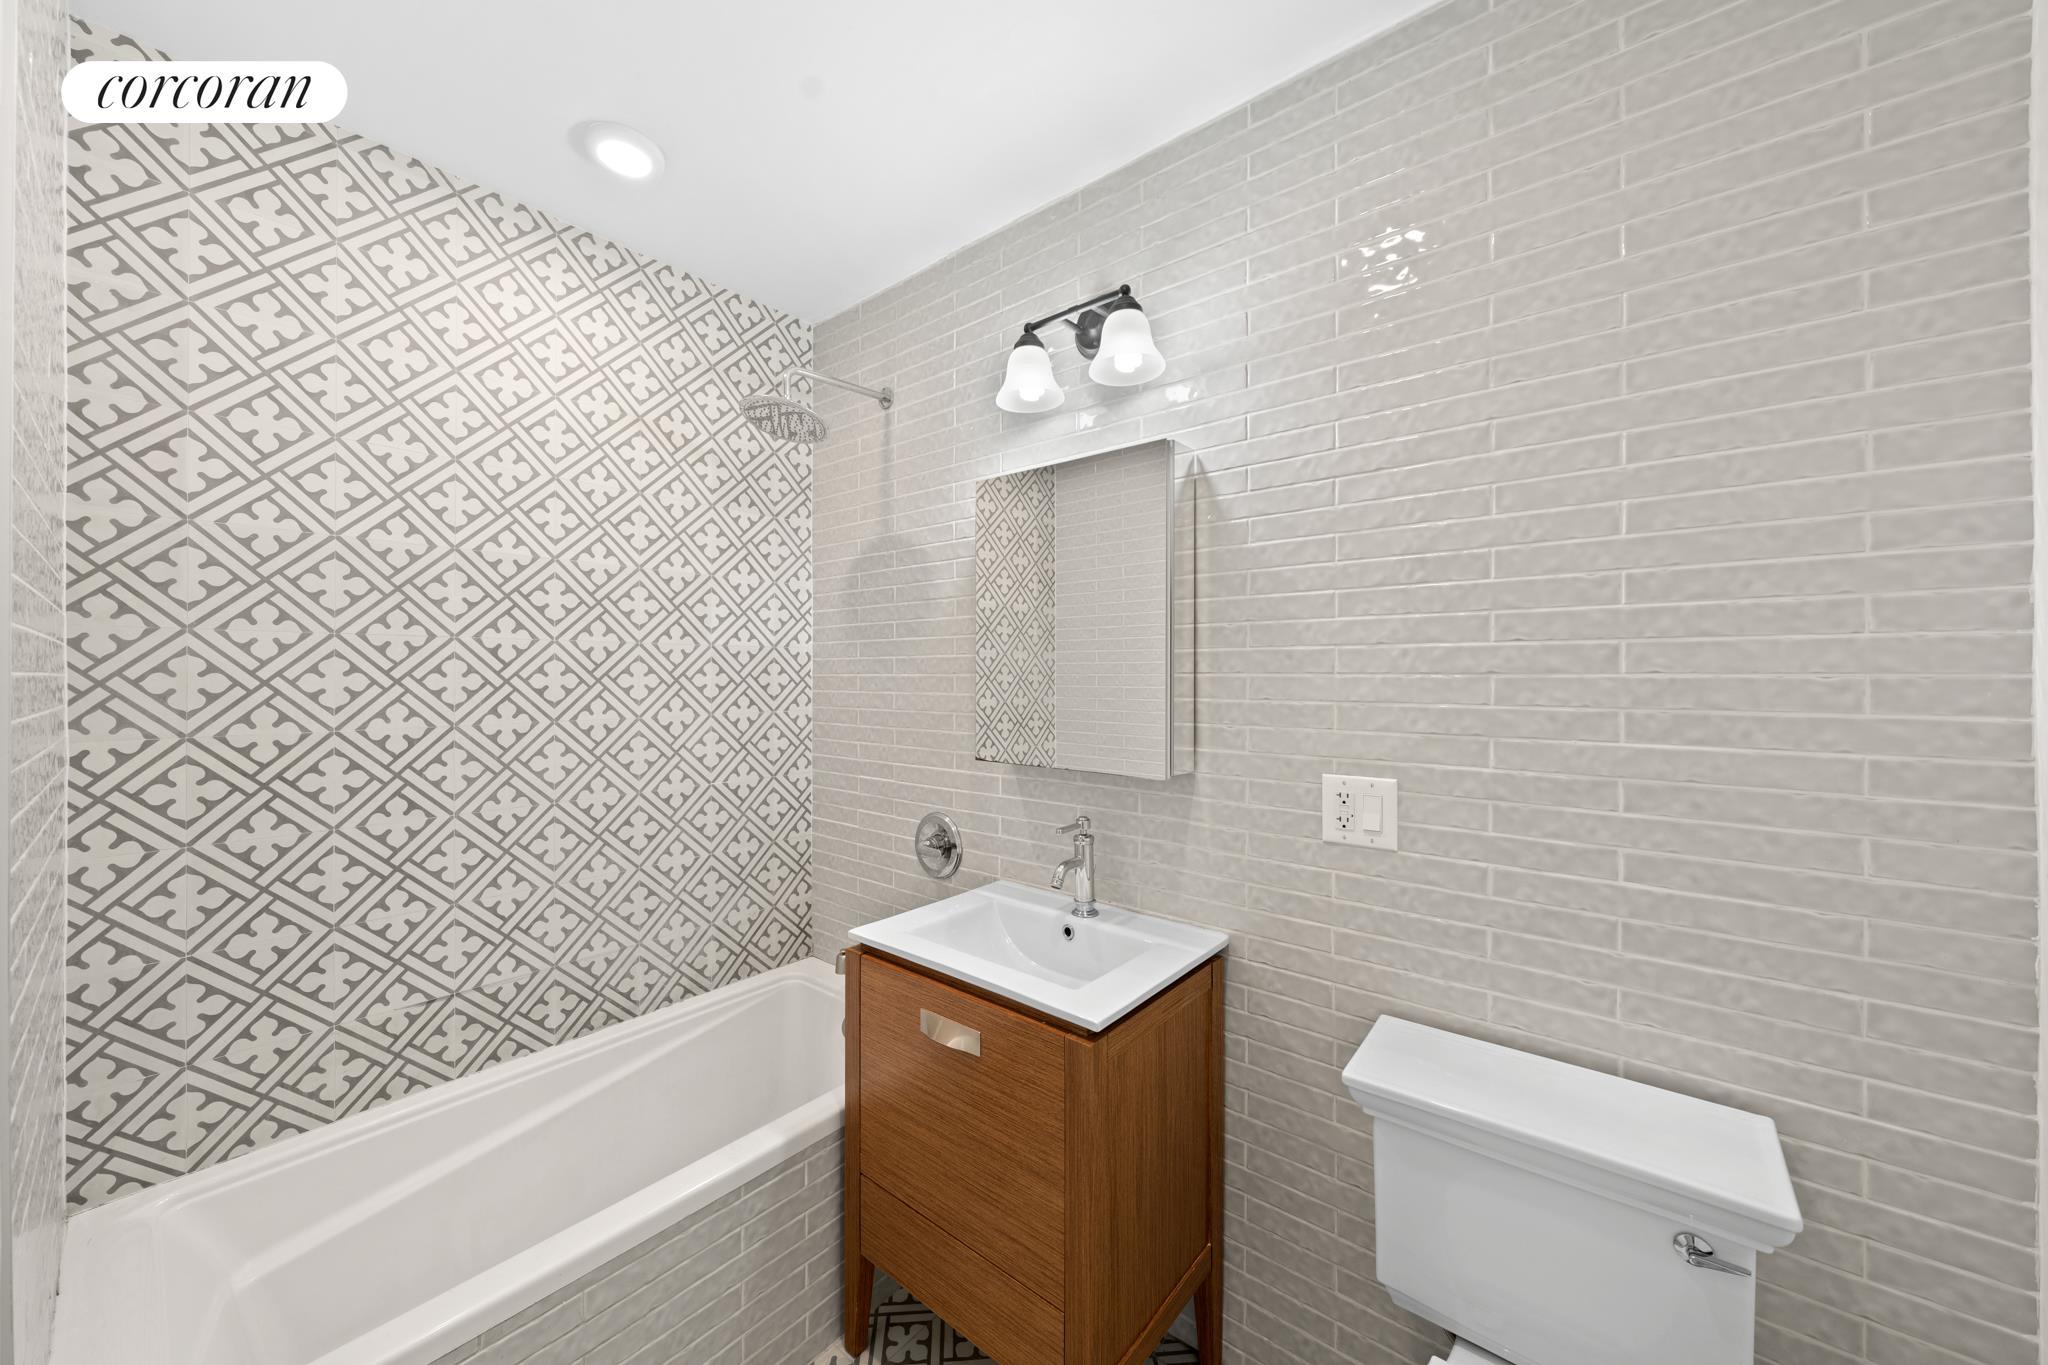 447-449 Decatur Street Bedford Stuyvesant Brooklyn NY 11233